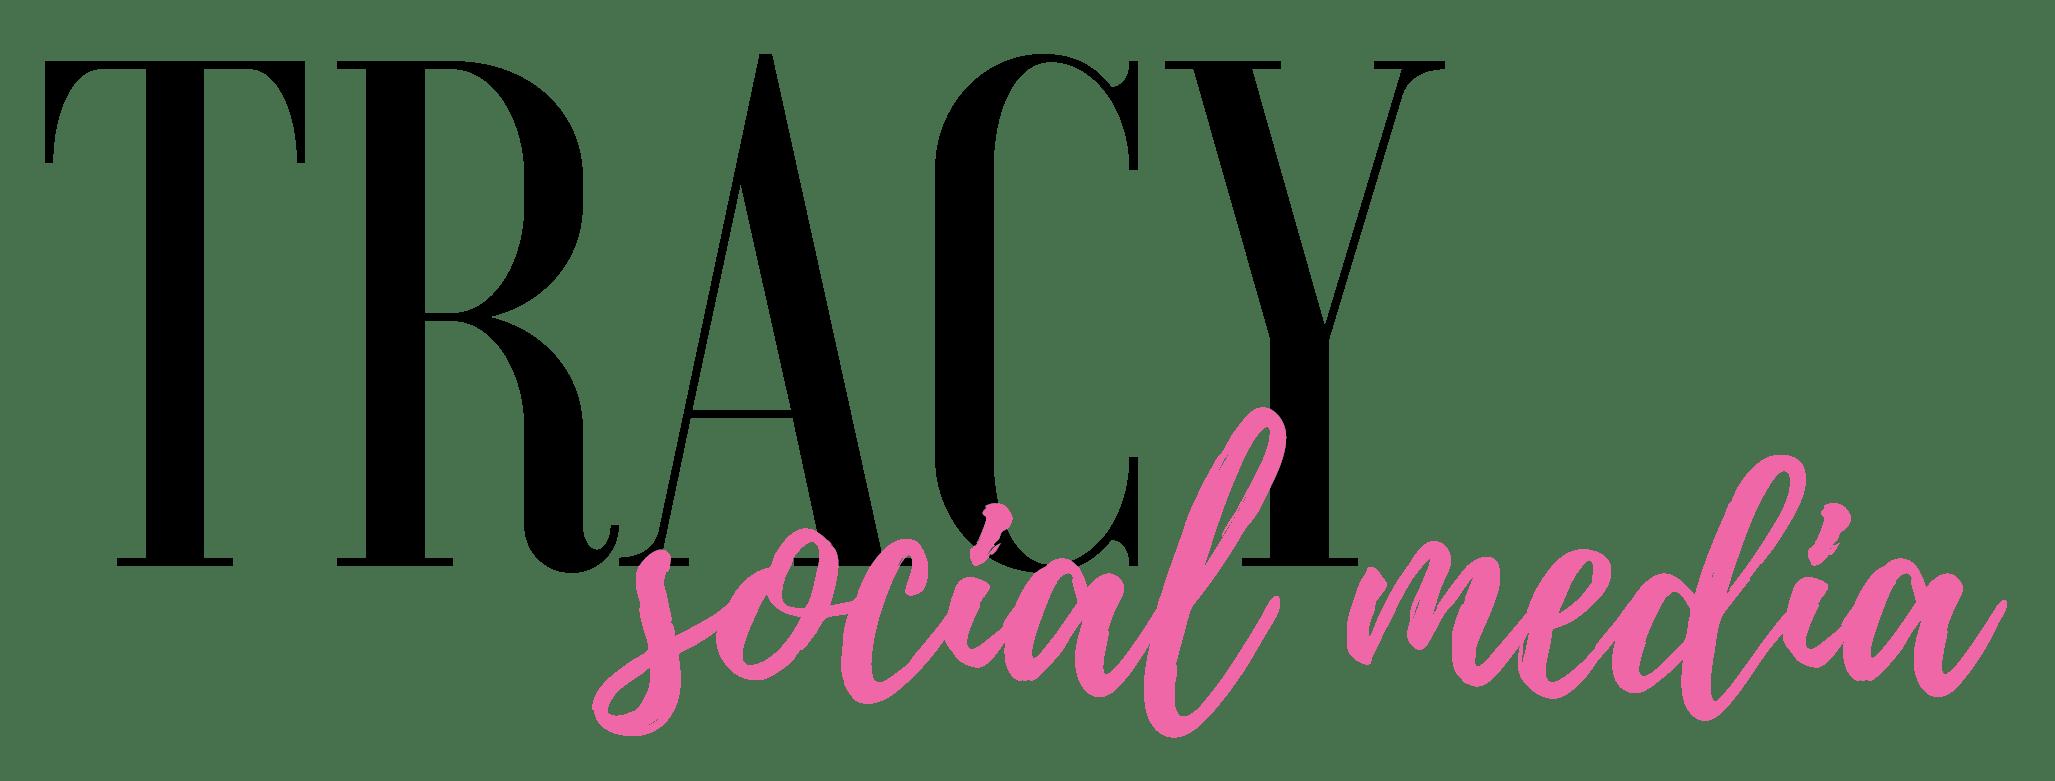 Tracy Social Media